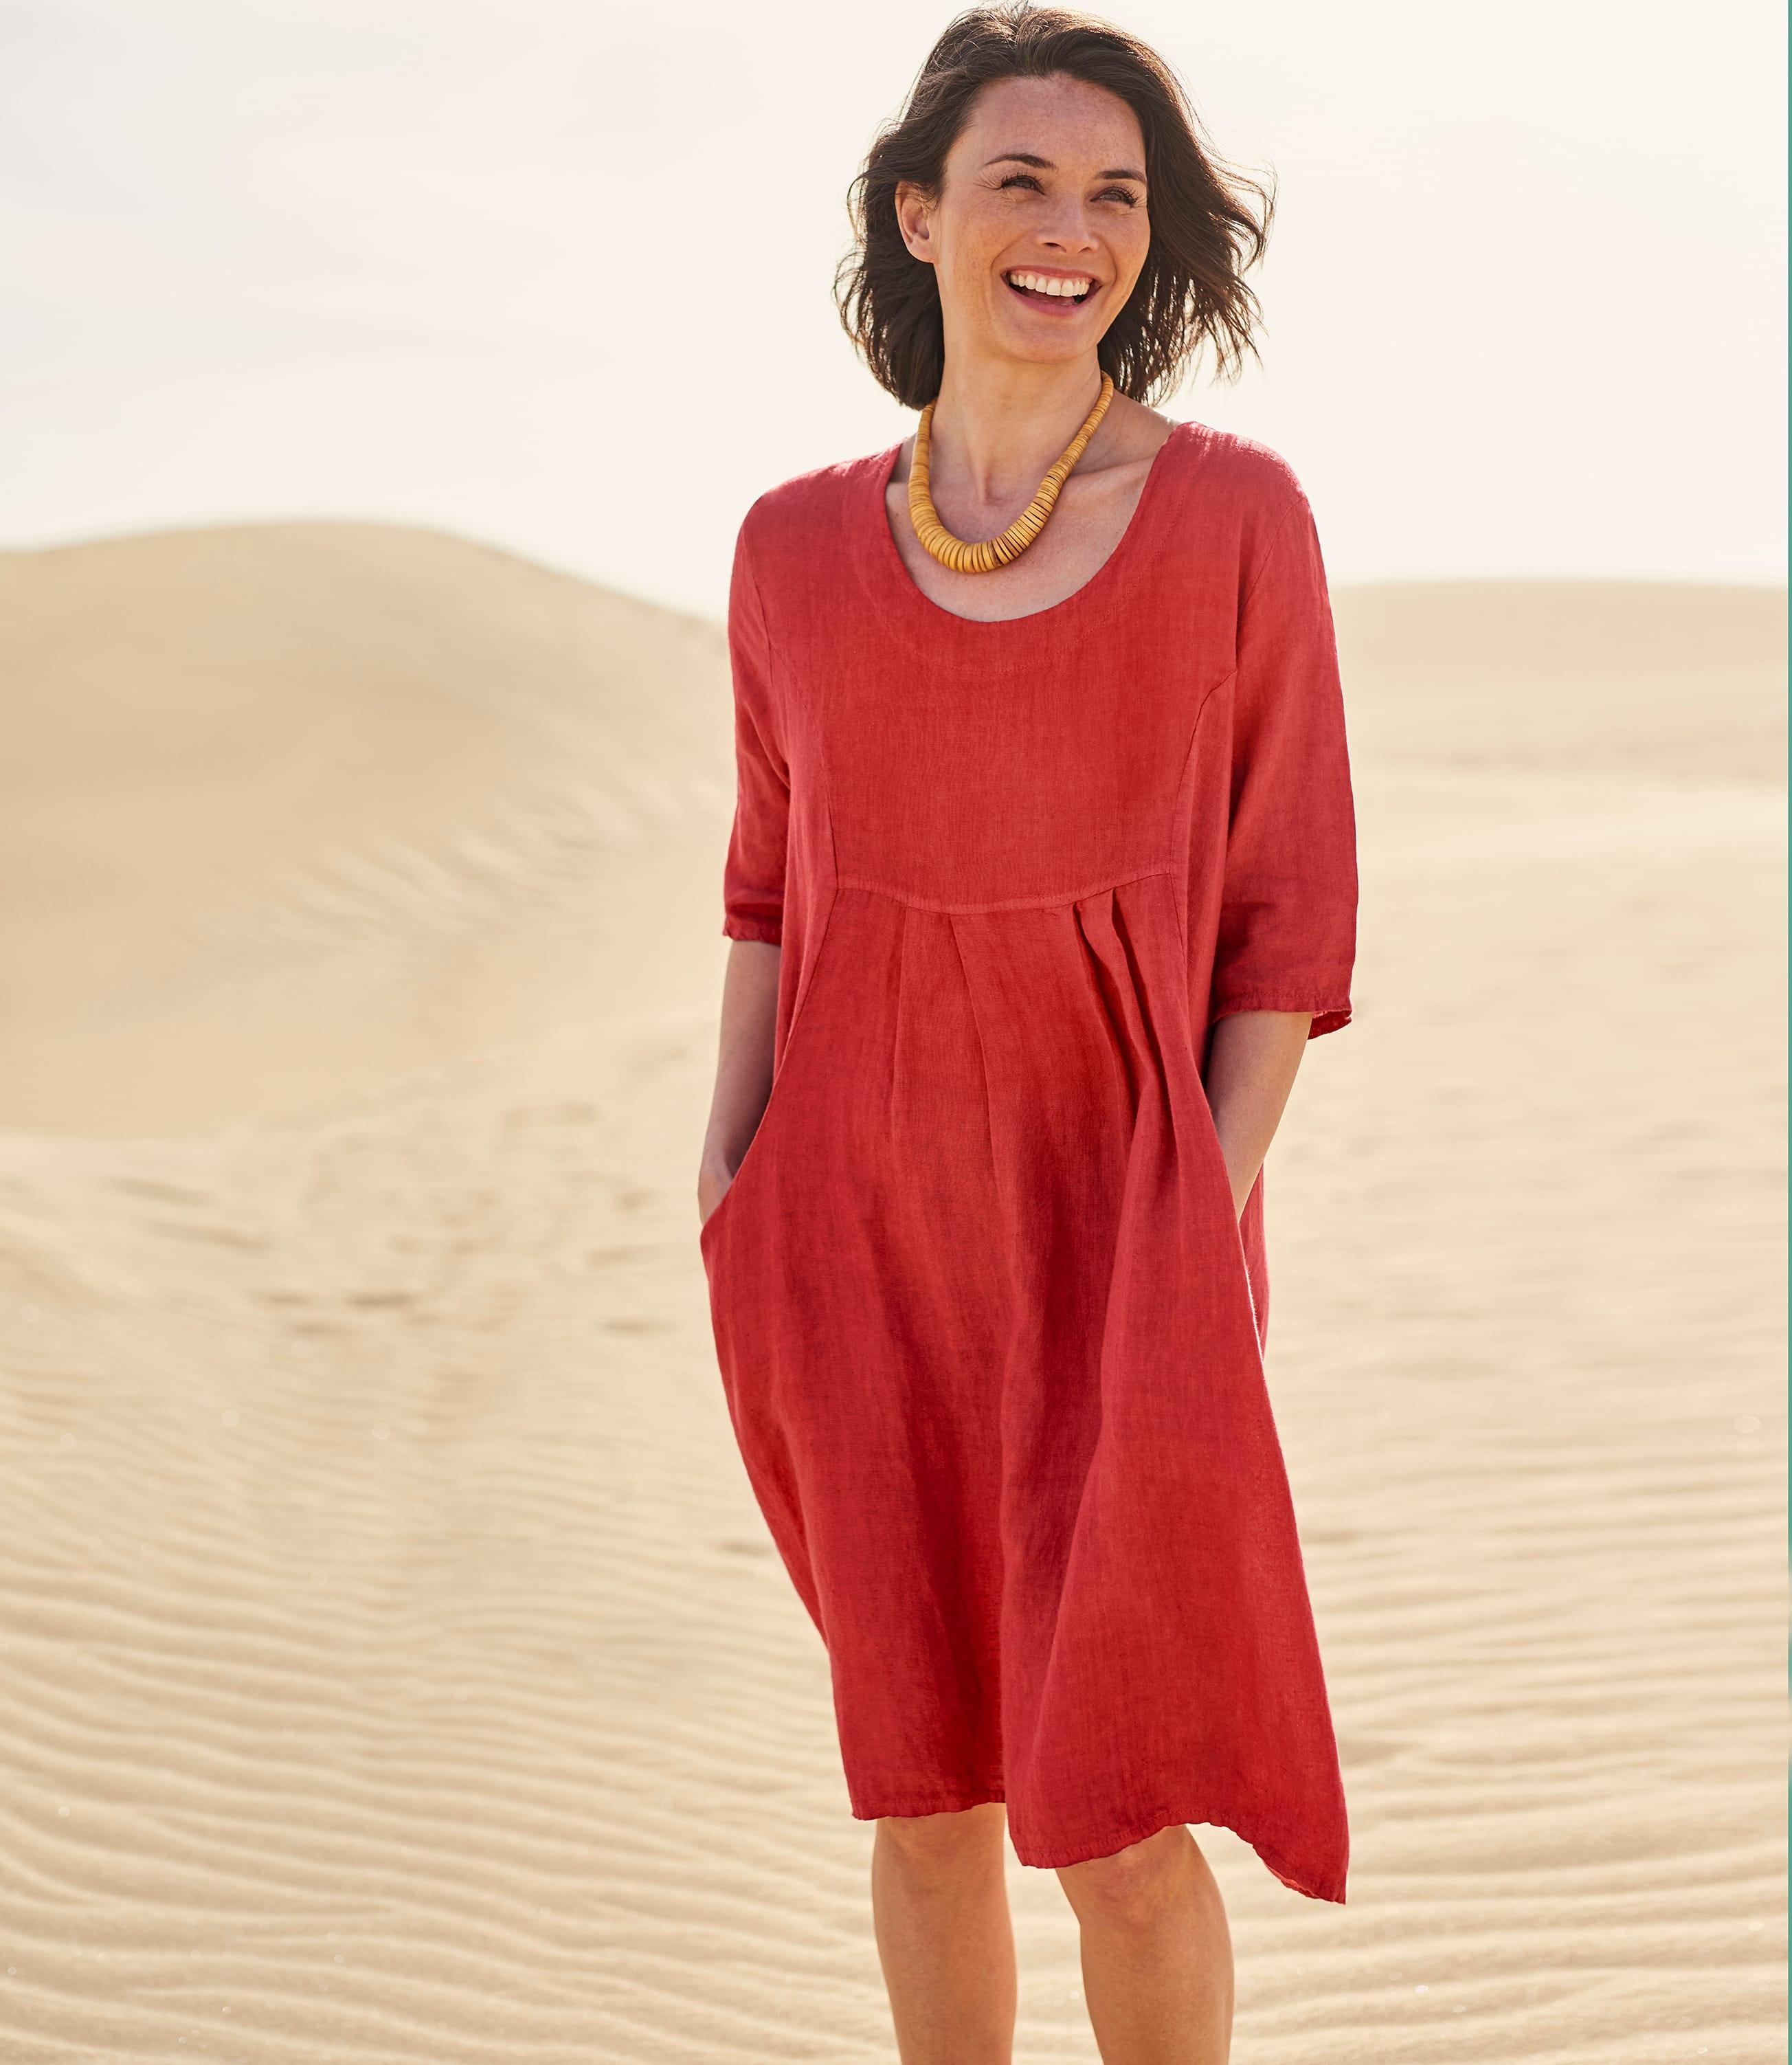 Robe-Tunique à poches - Femme - Pur Lin